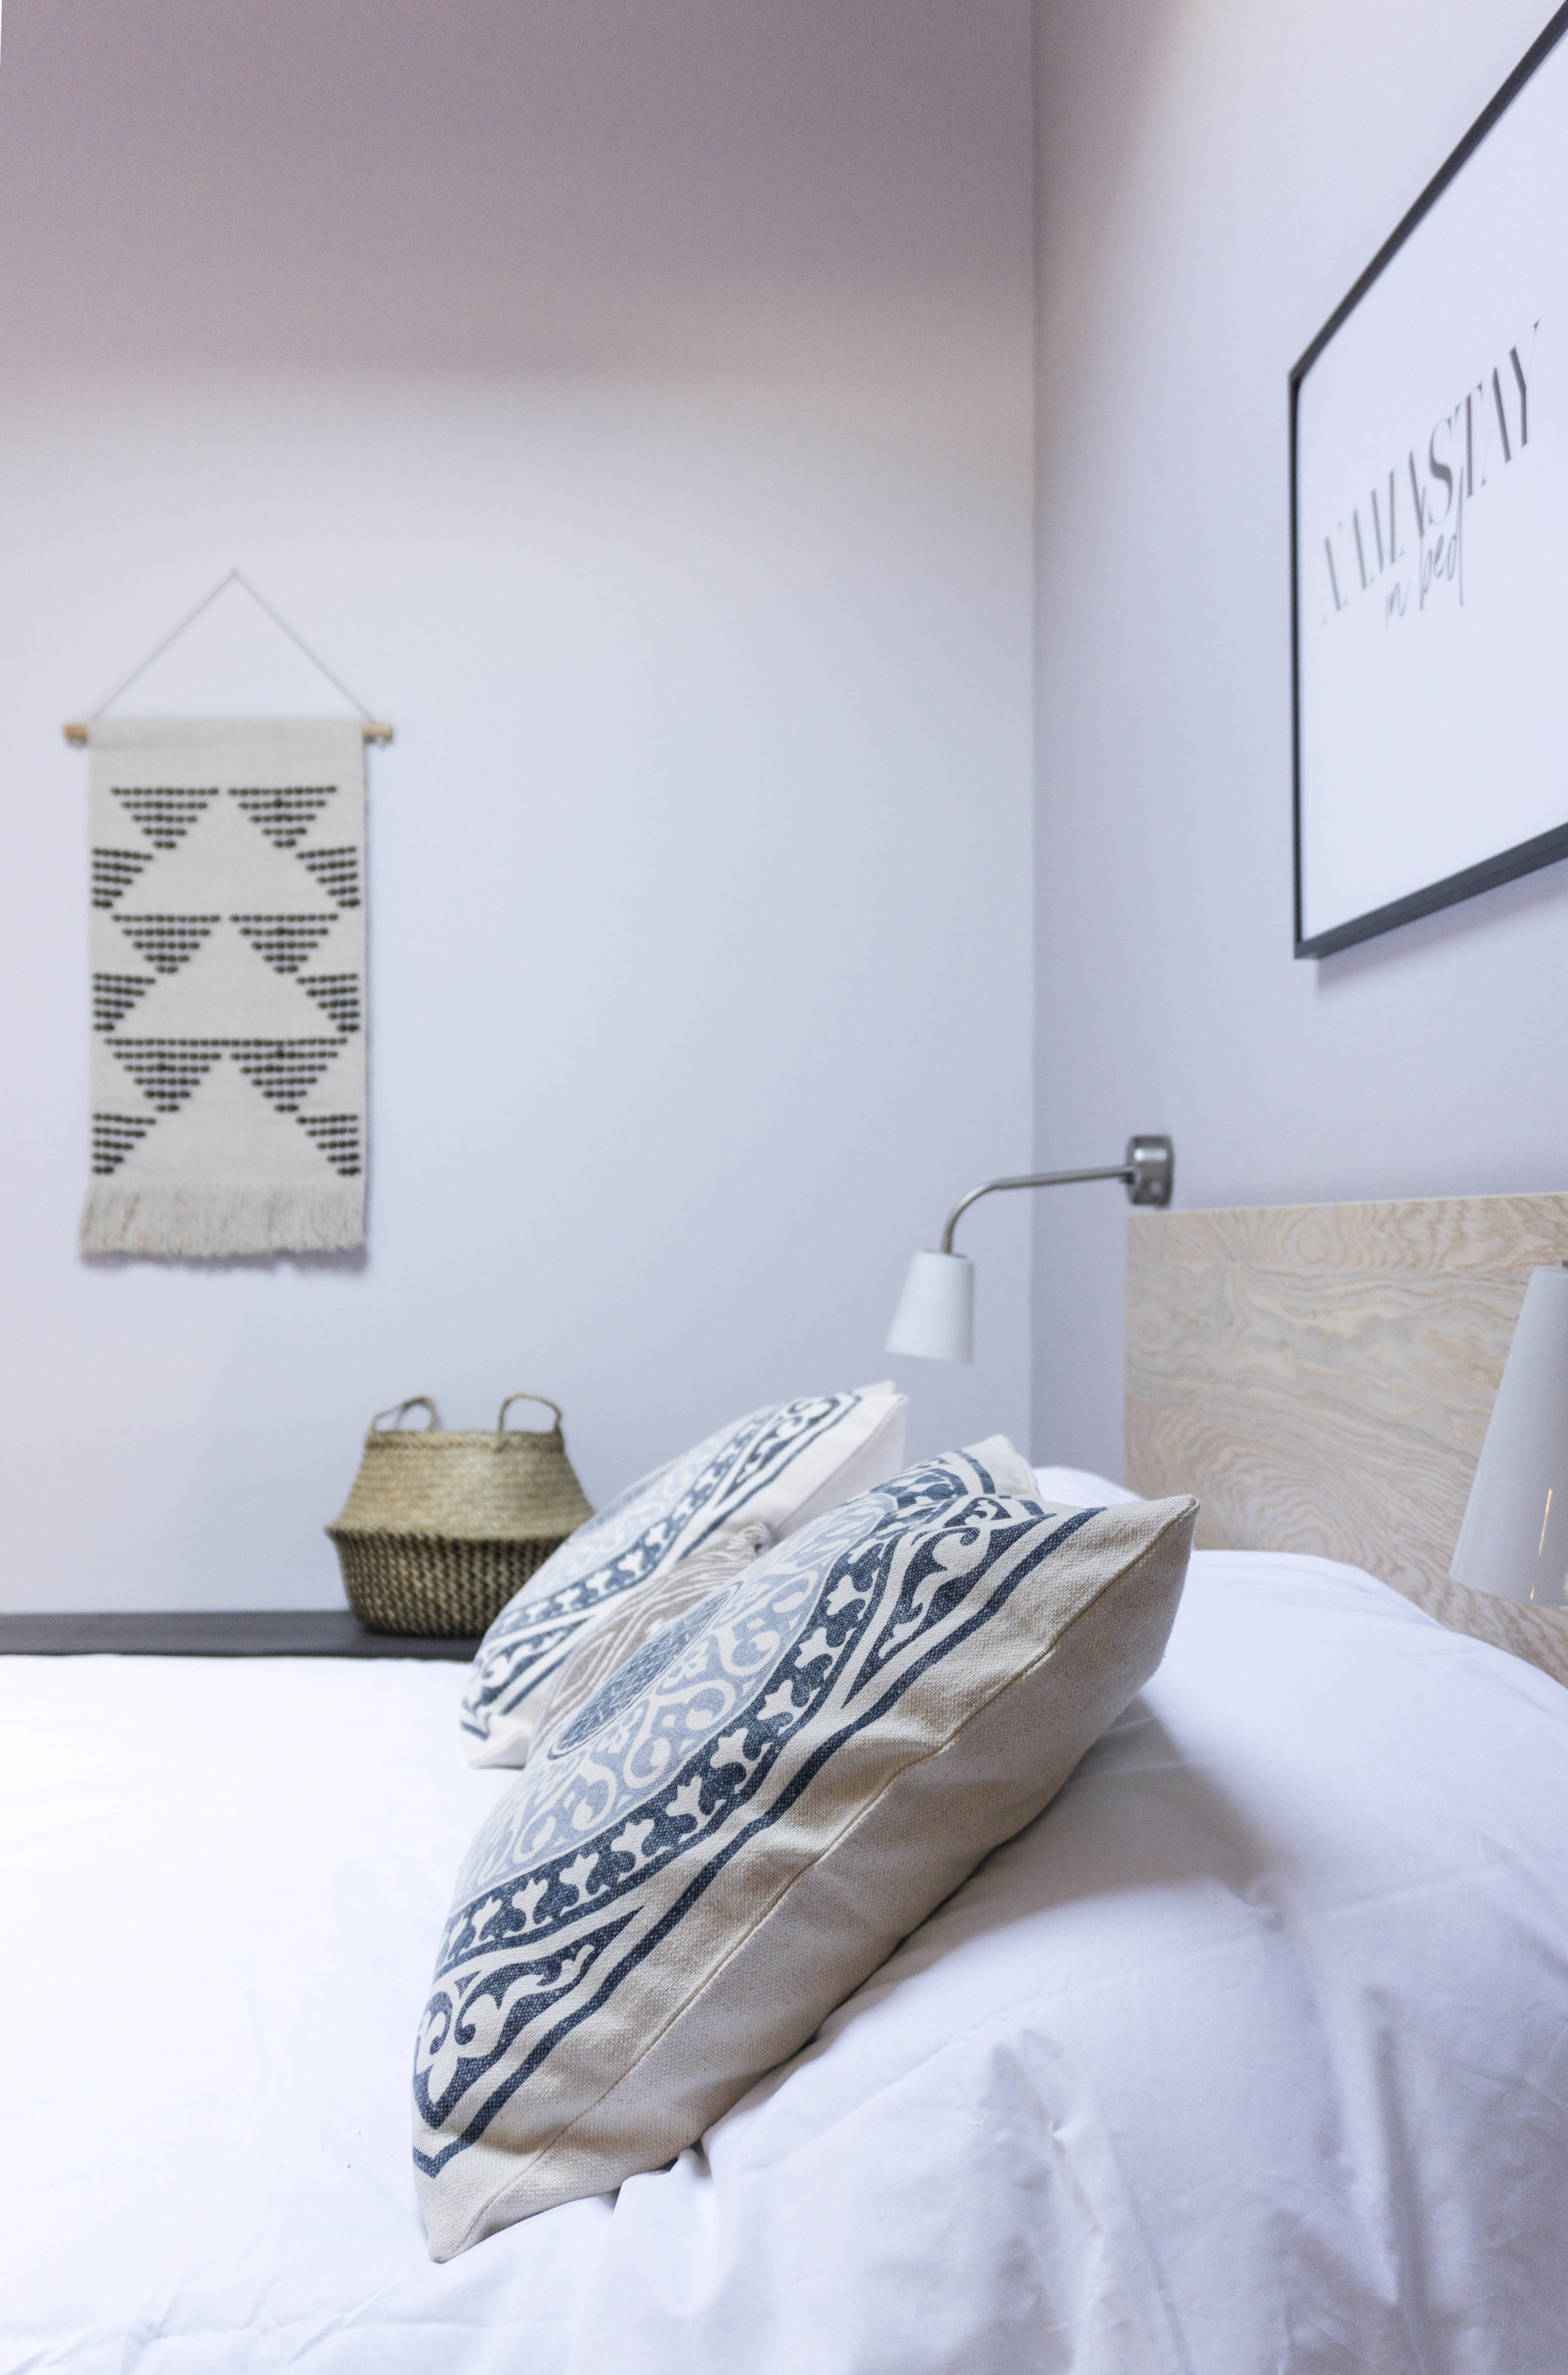 viviendas turisticas Madrid emmme studio slow design Guadarrama dormitorio 02.jpg